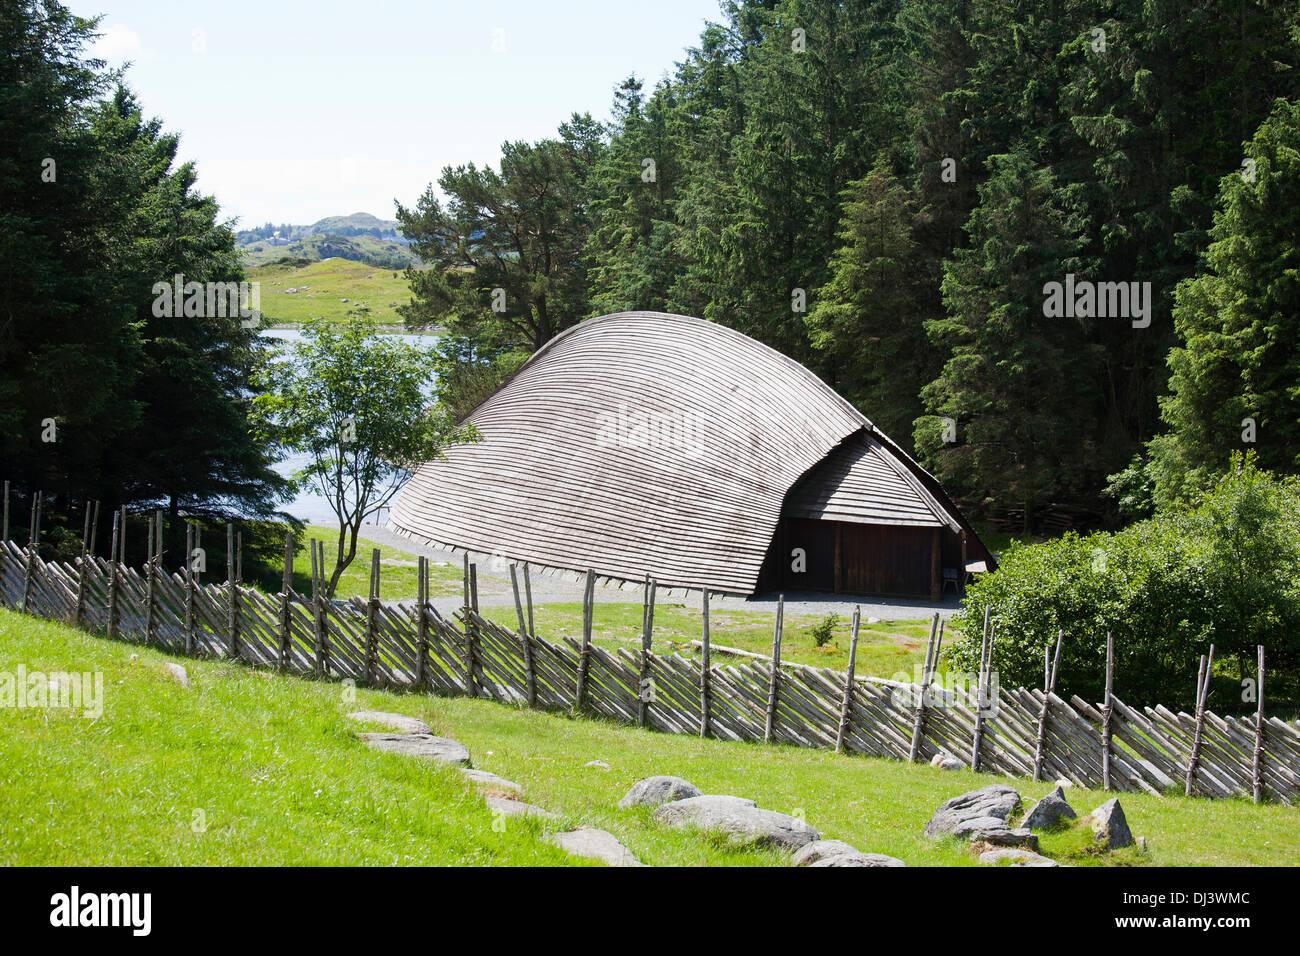 europa norwegen avaldsnes wikingerdorf traditionelles haus stockfoto bild 62780940 alamy. Black Bedroom Furniture Sets. Home Design Ideas